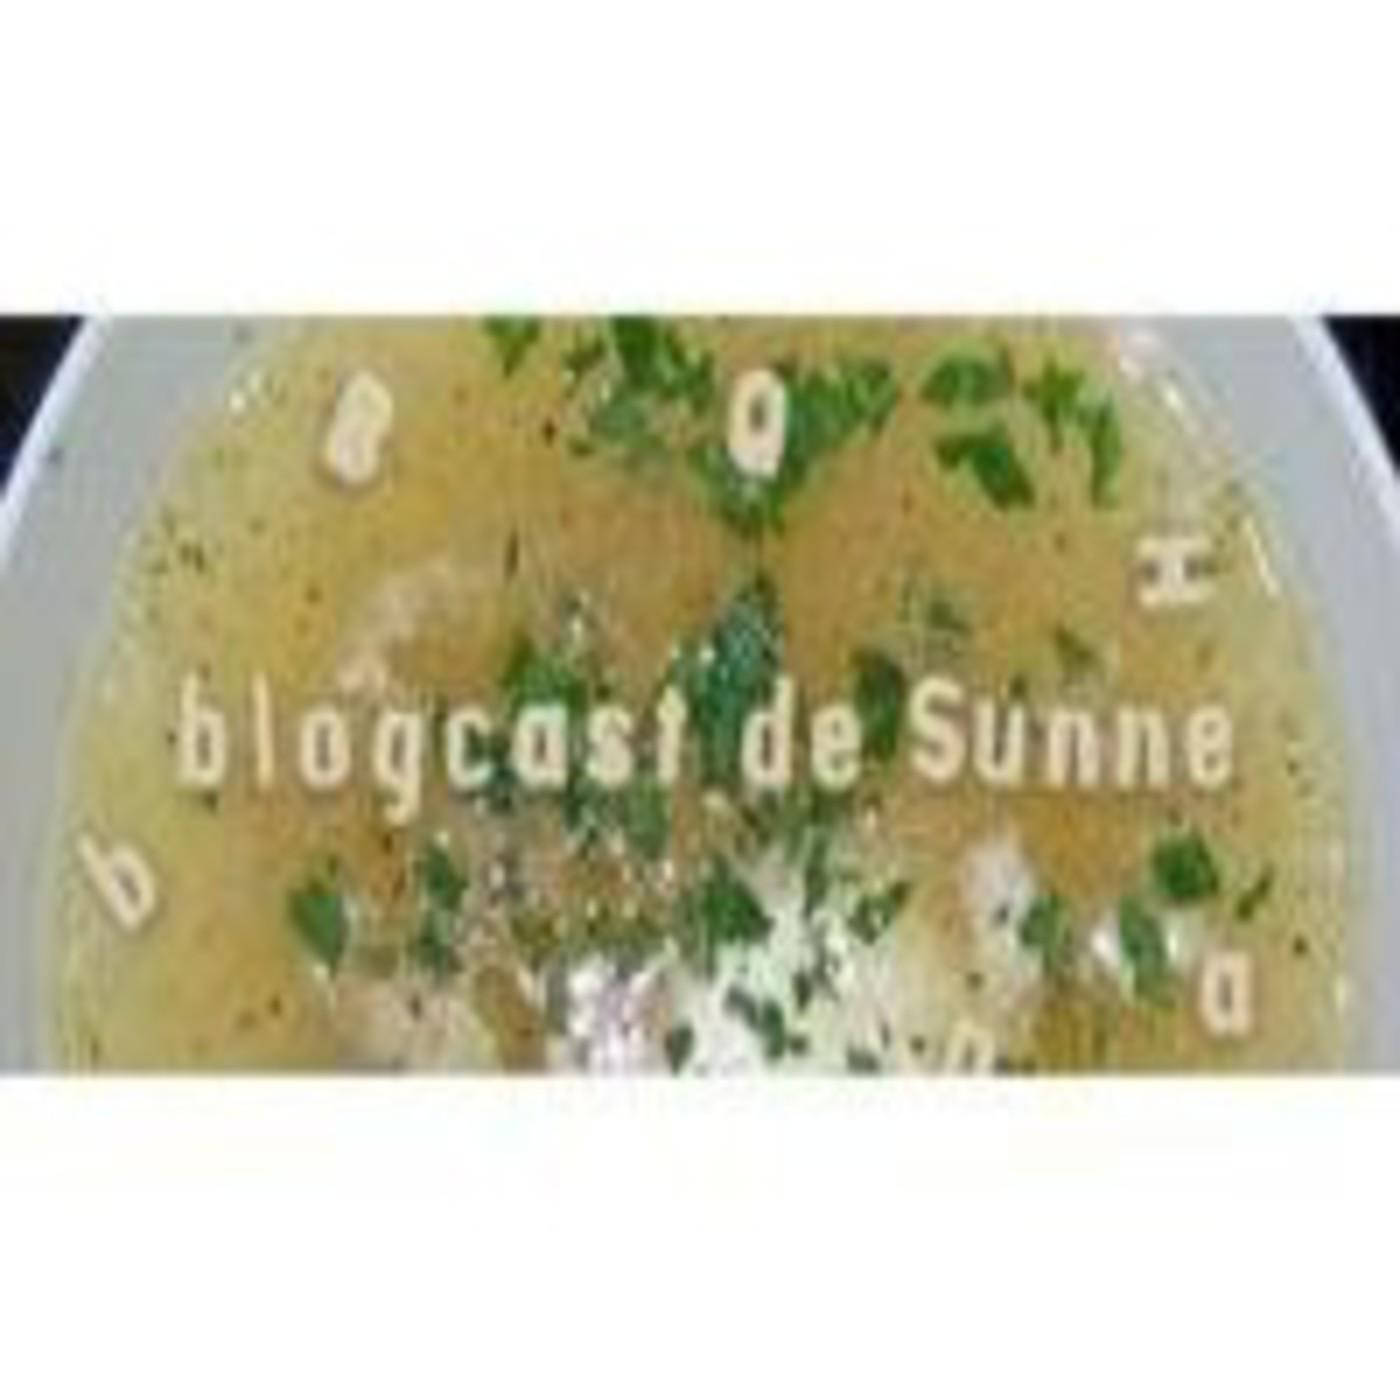 <![CDATA[Sunne blogcast]]>